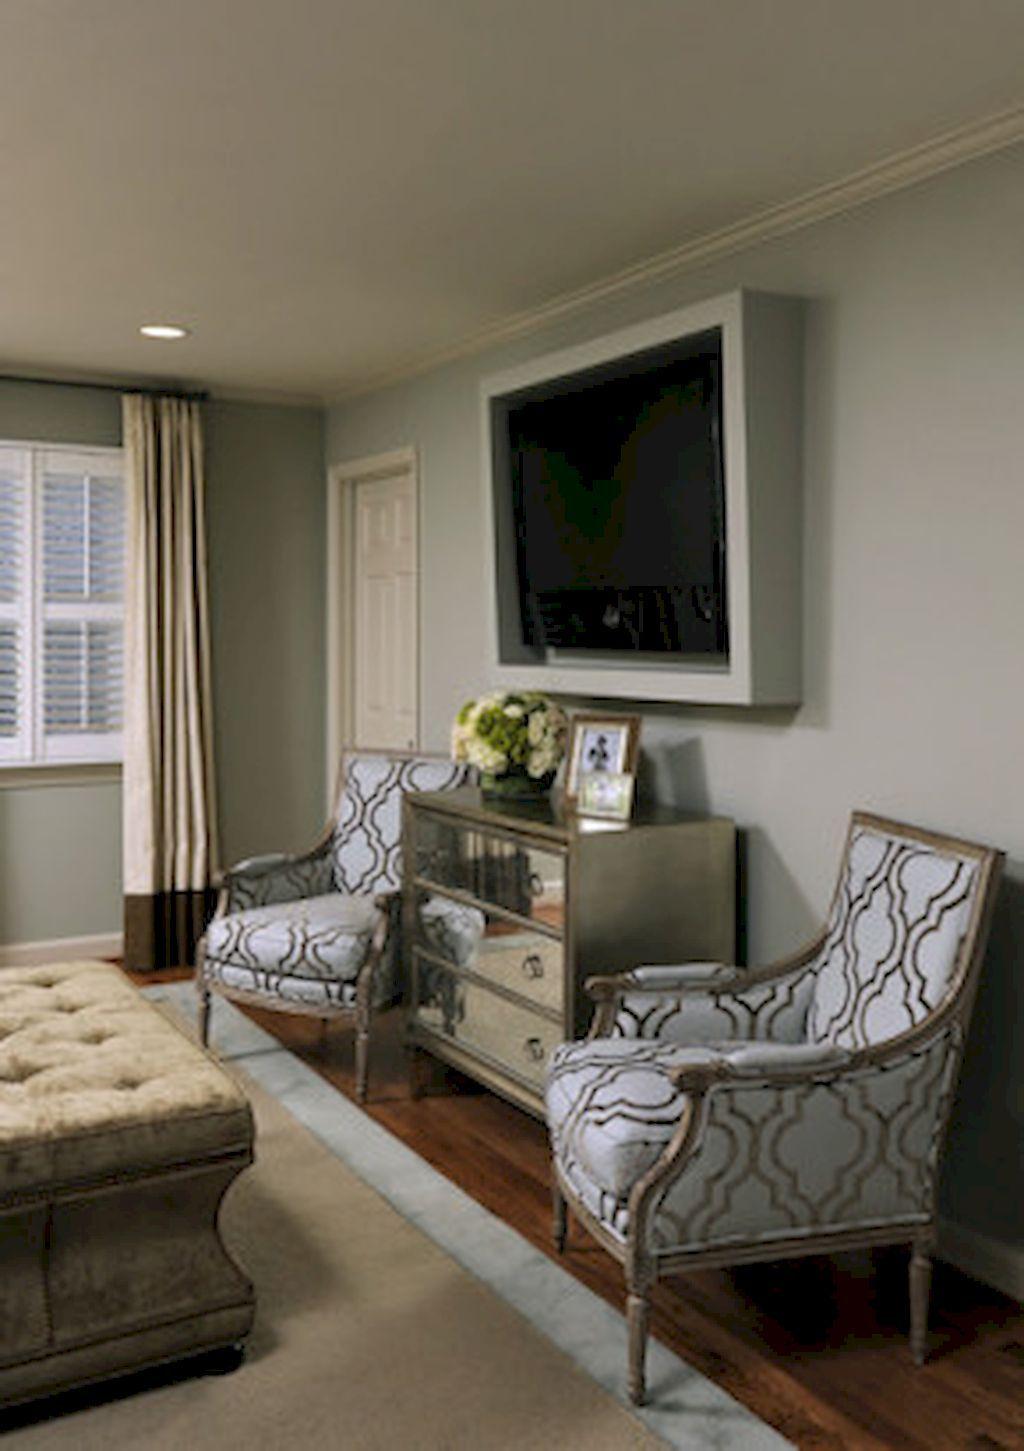 60 Incredible Bedroom TV Wall Ideas | Bedroom furniture ...